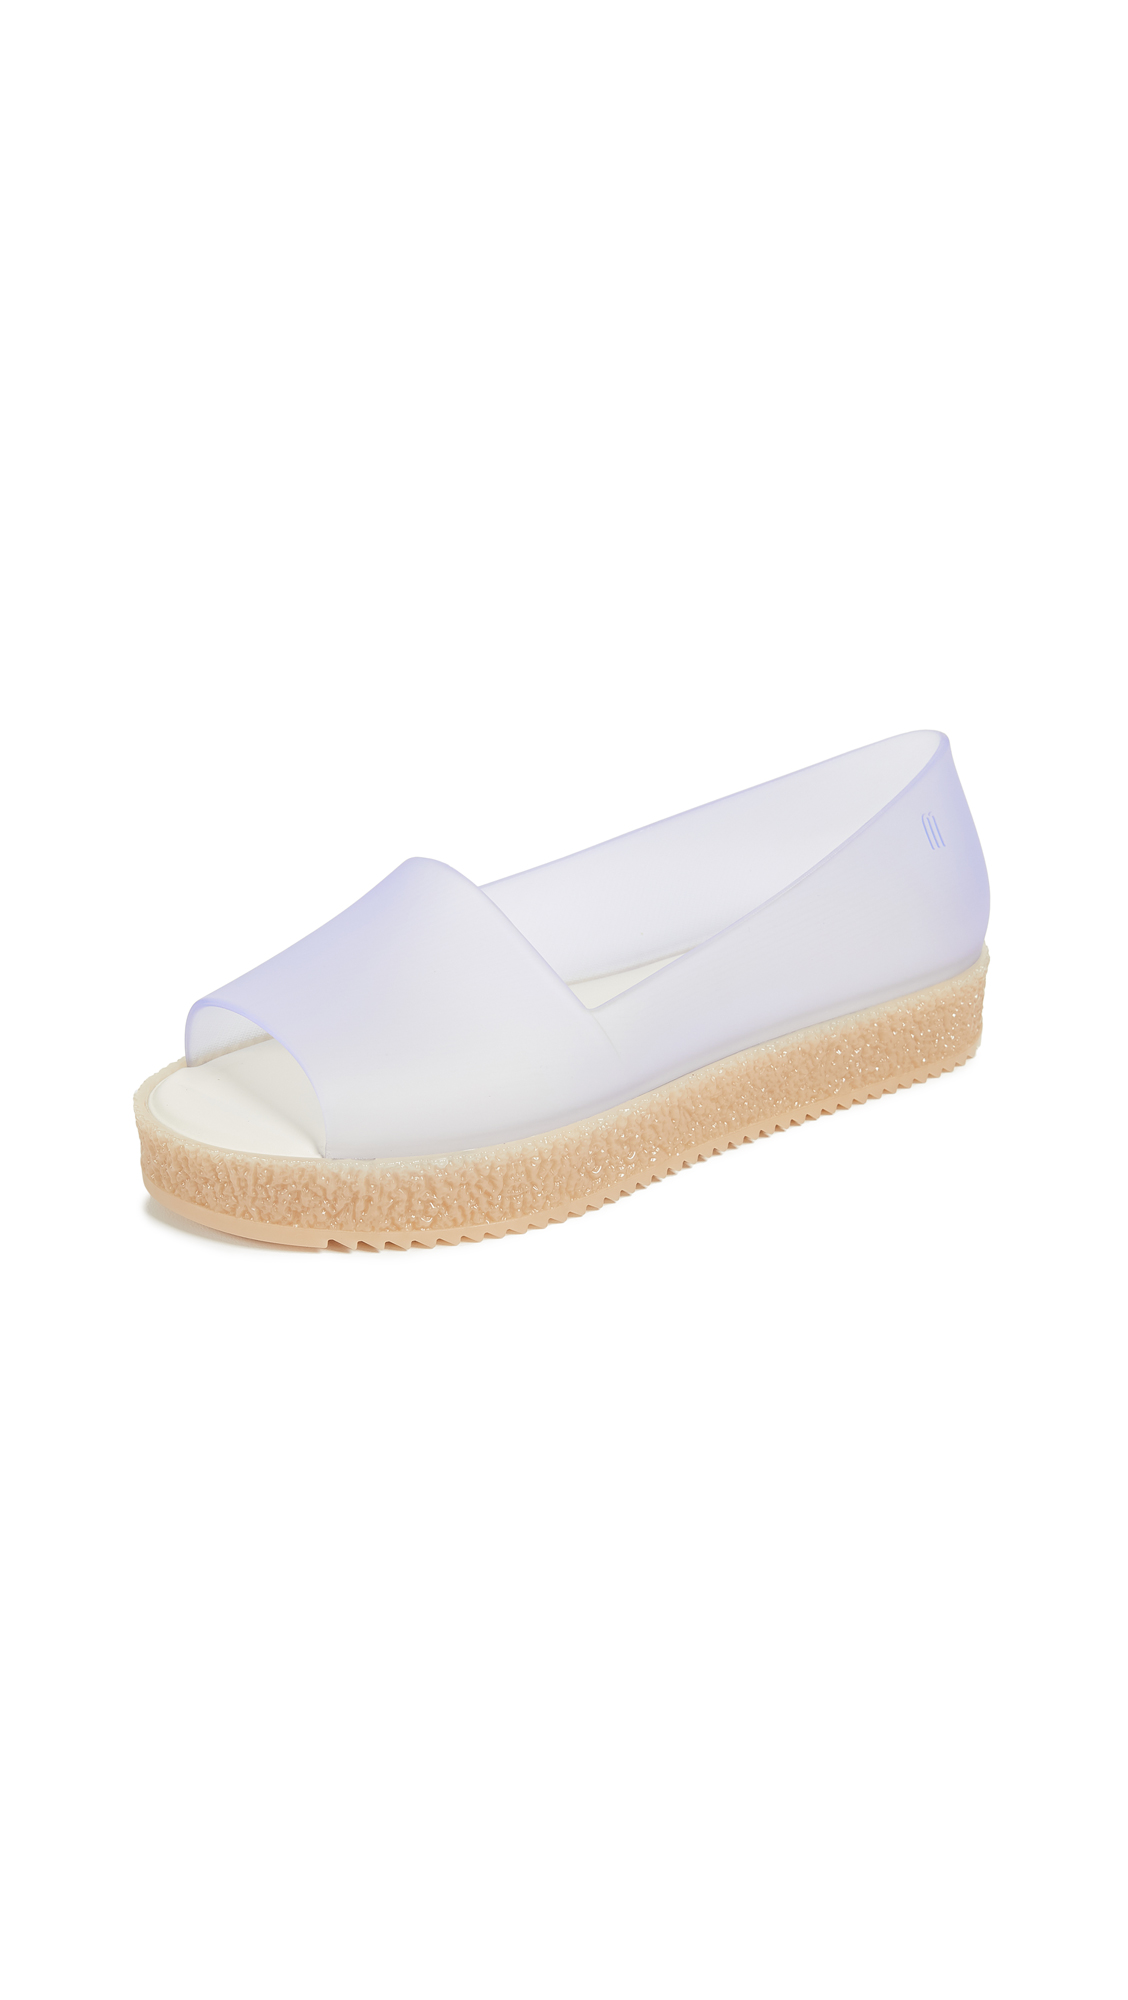 Melissa Puzzle Peep Toe Flats - Clear